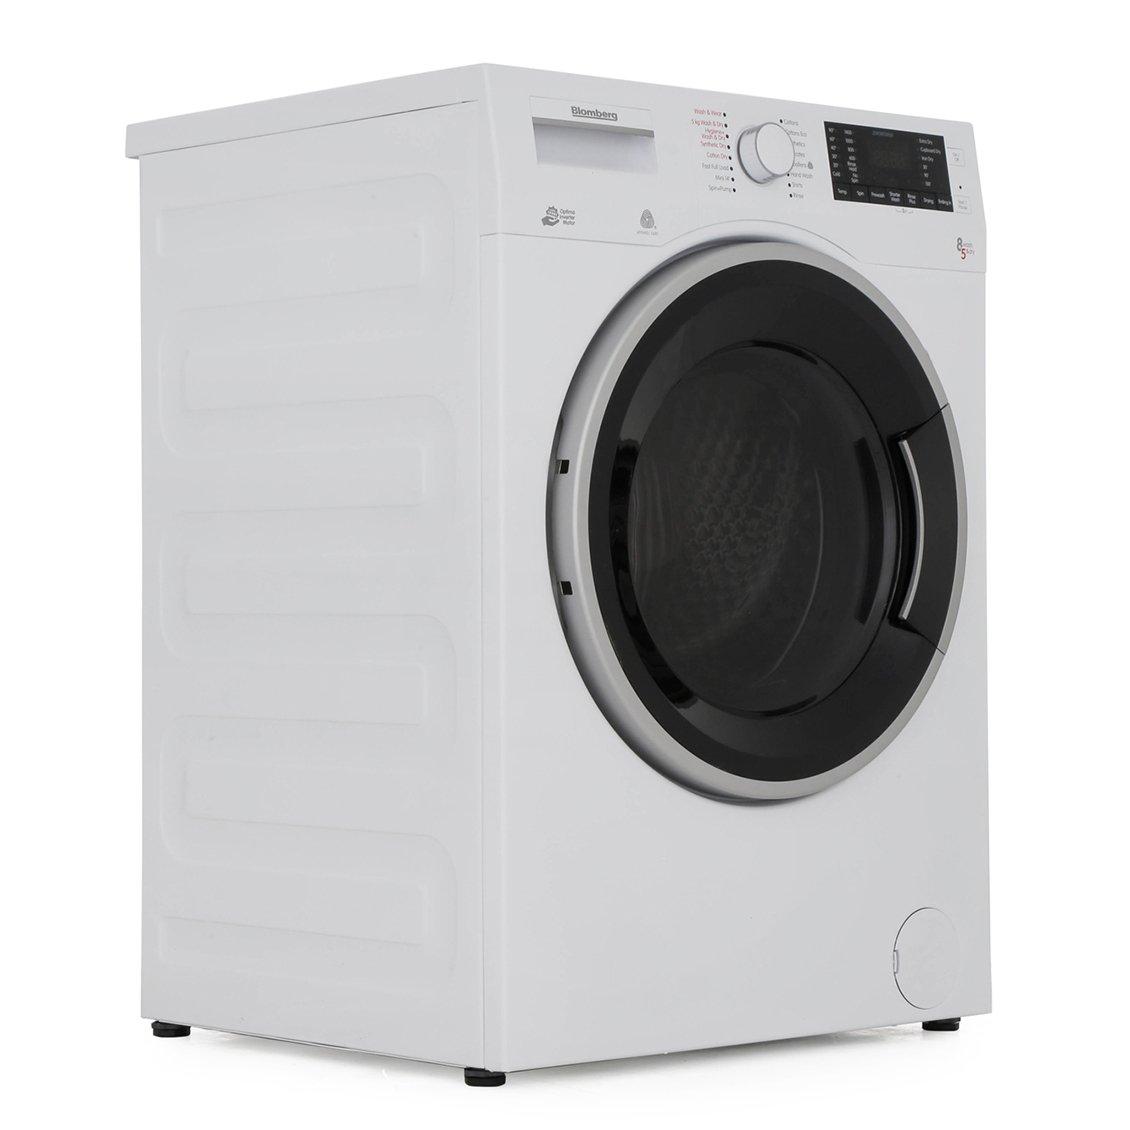 Blomberg LRF2854111W Washer Dryer